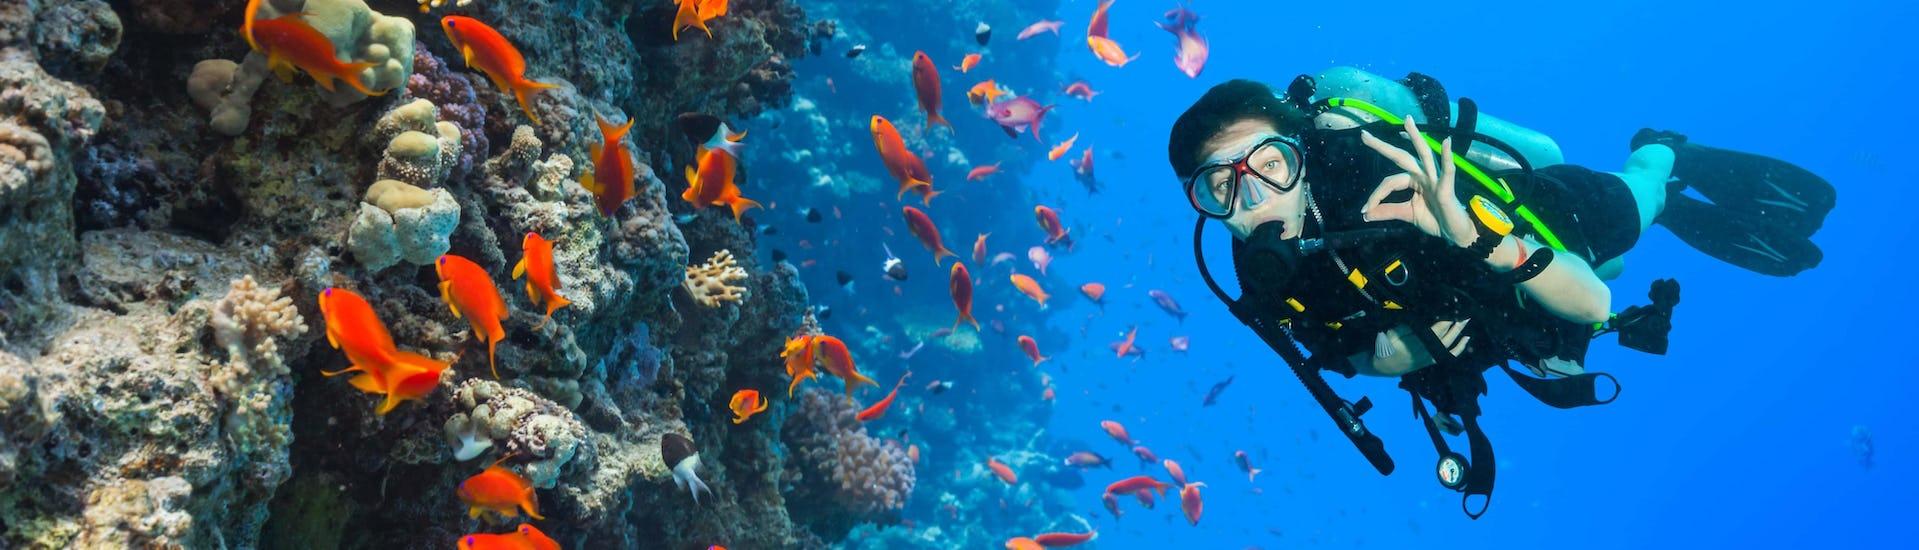 Diving (c) Shutterstock